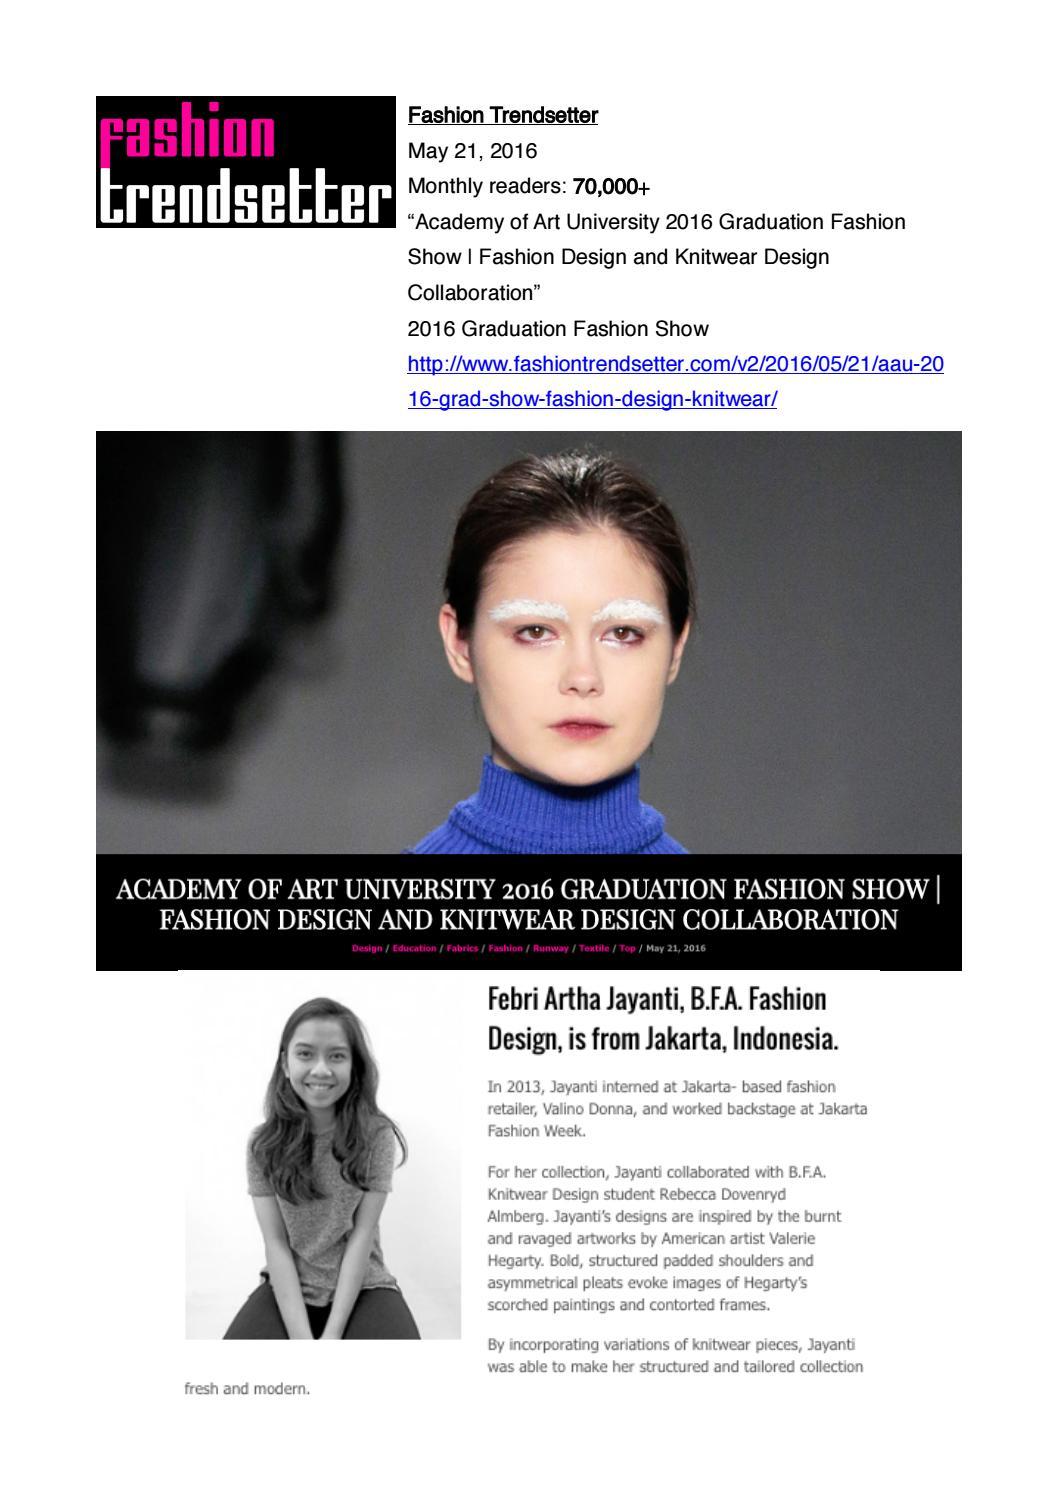 05 21 2016 Fashion Trendsetter By Academy Of Art University School Of Fashion Issuu